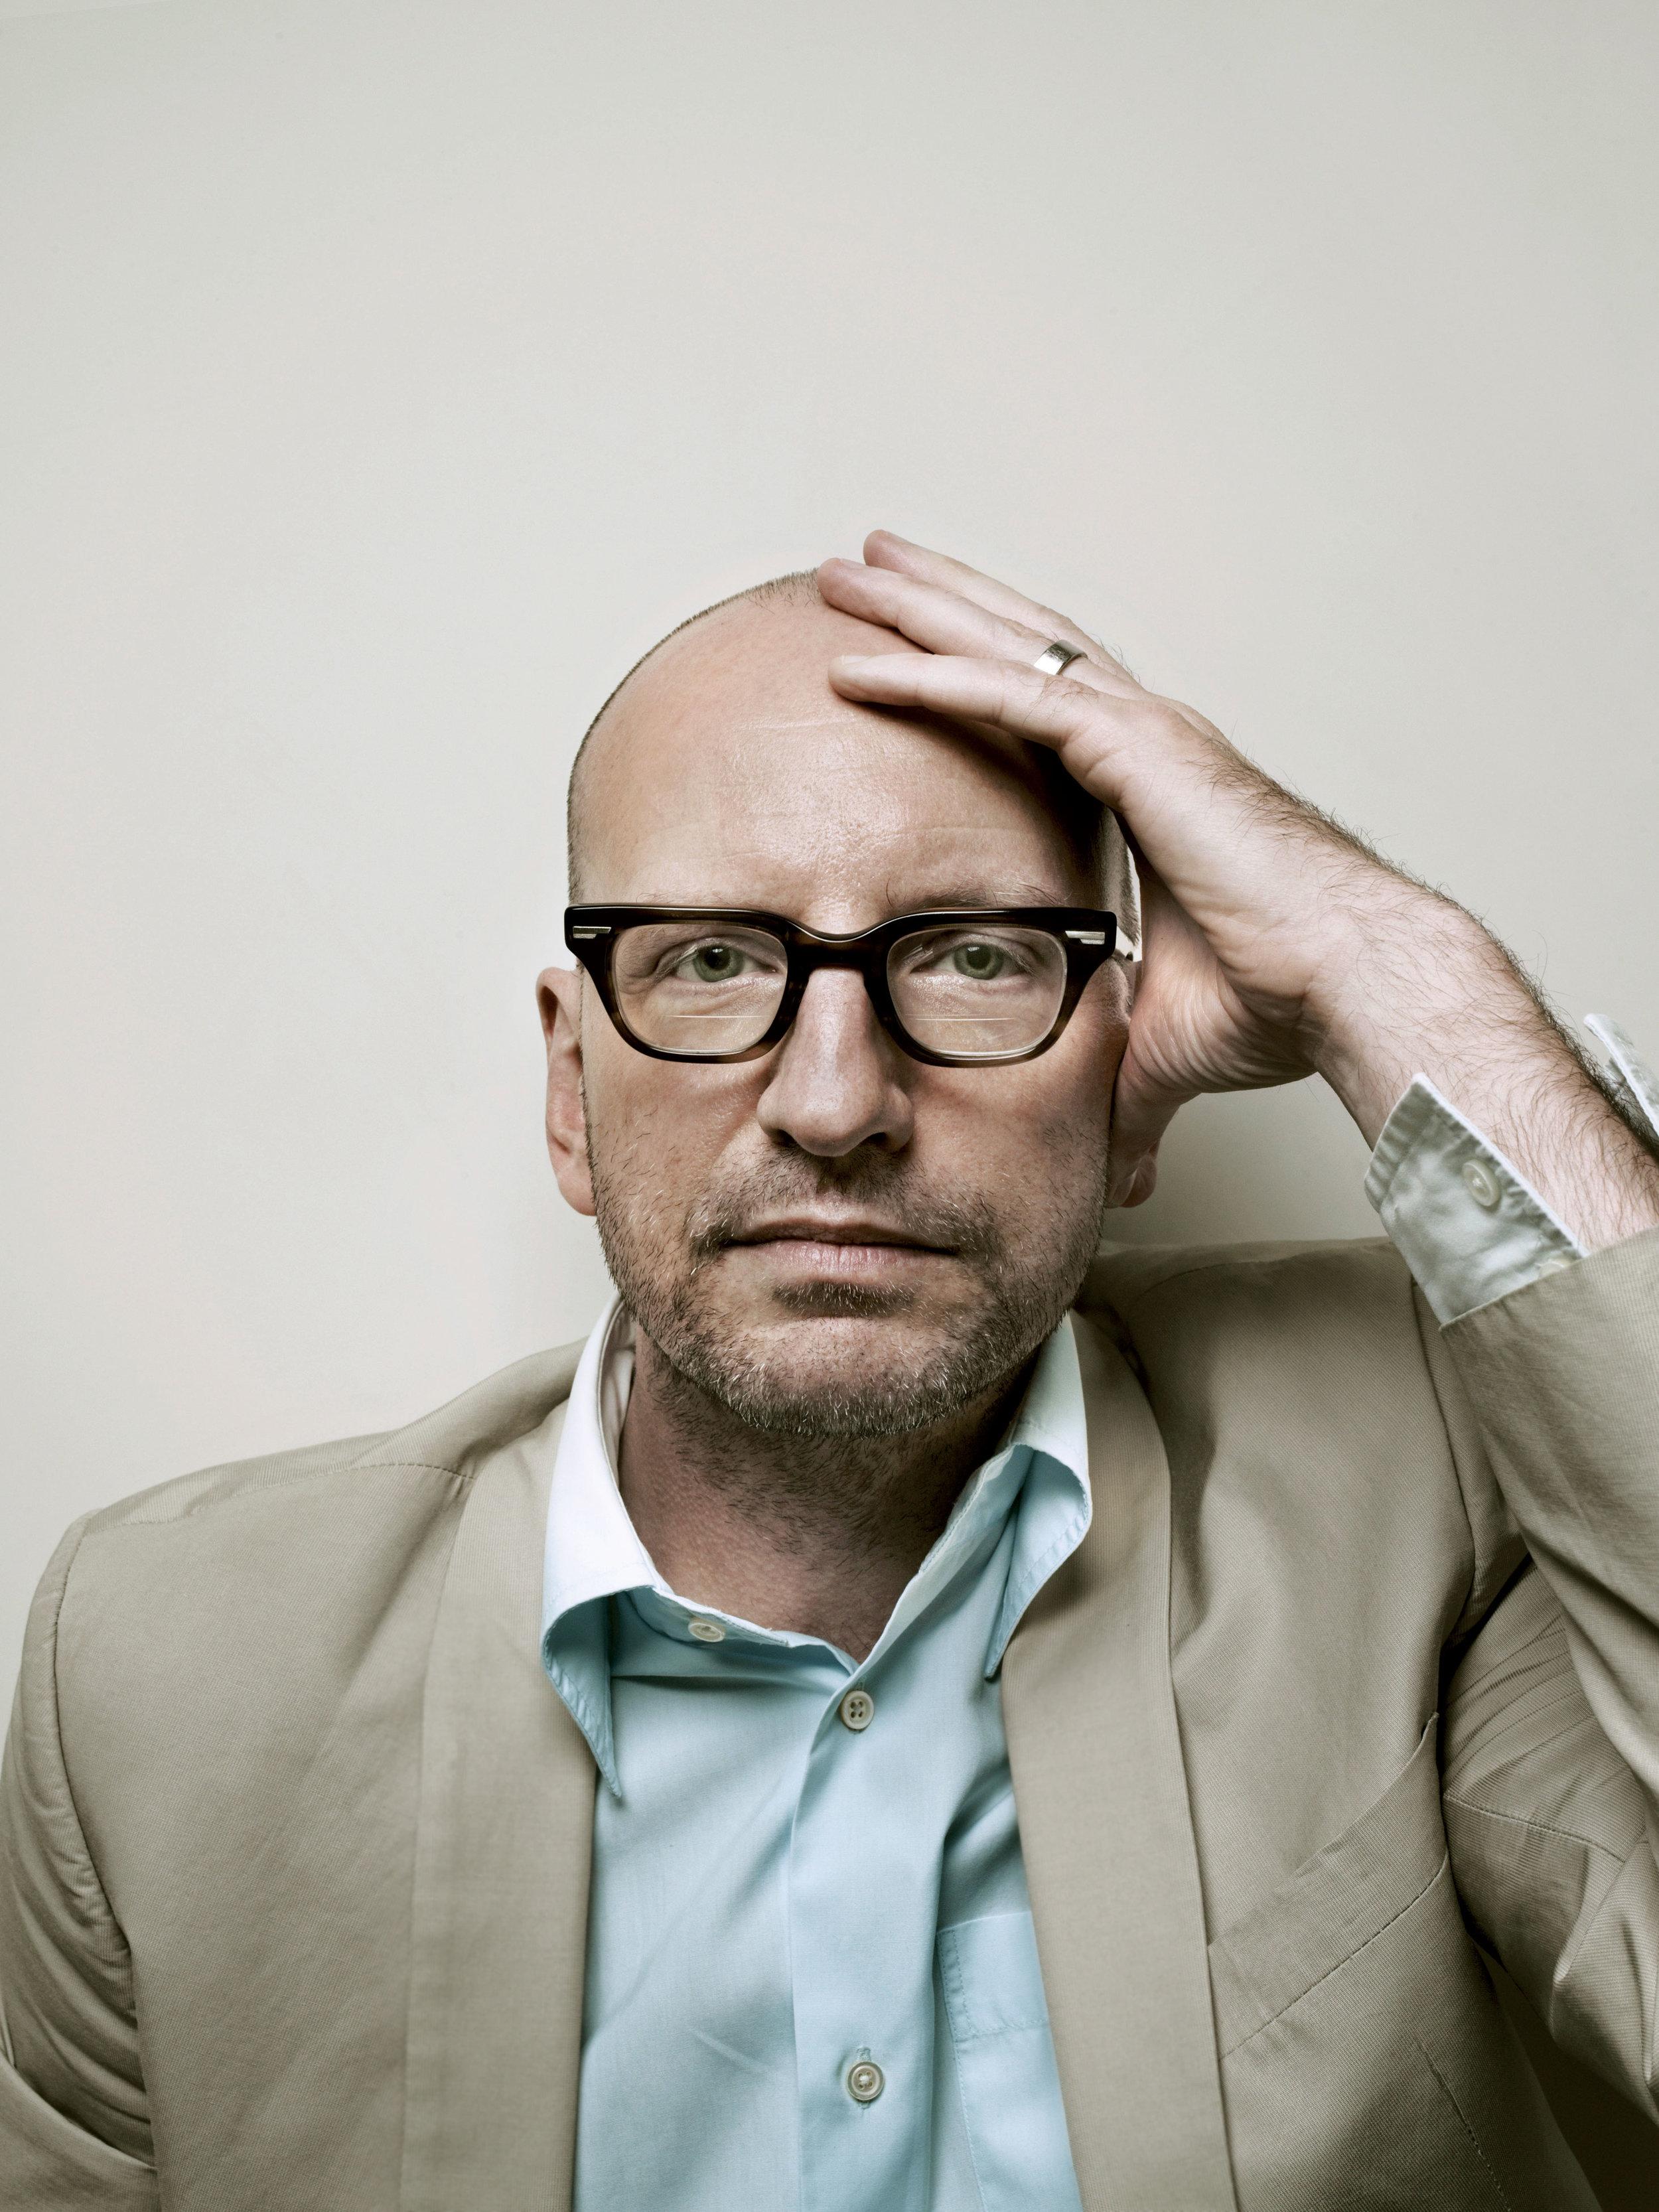 Steven Soderbergh - Film Director, Screenwriter, Producer